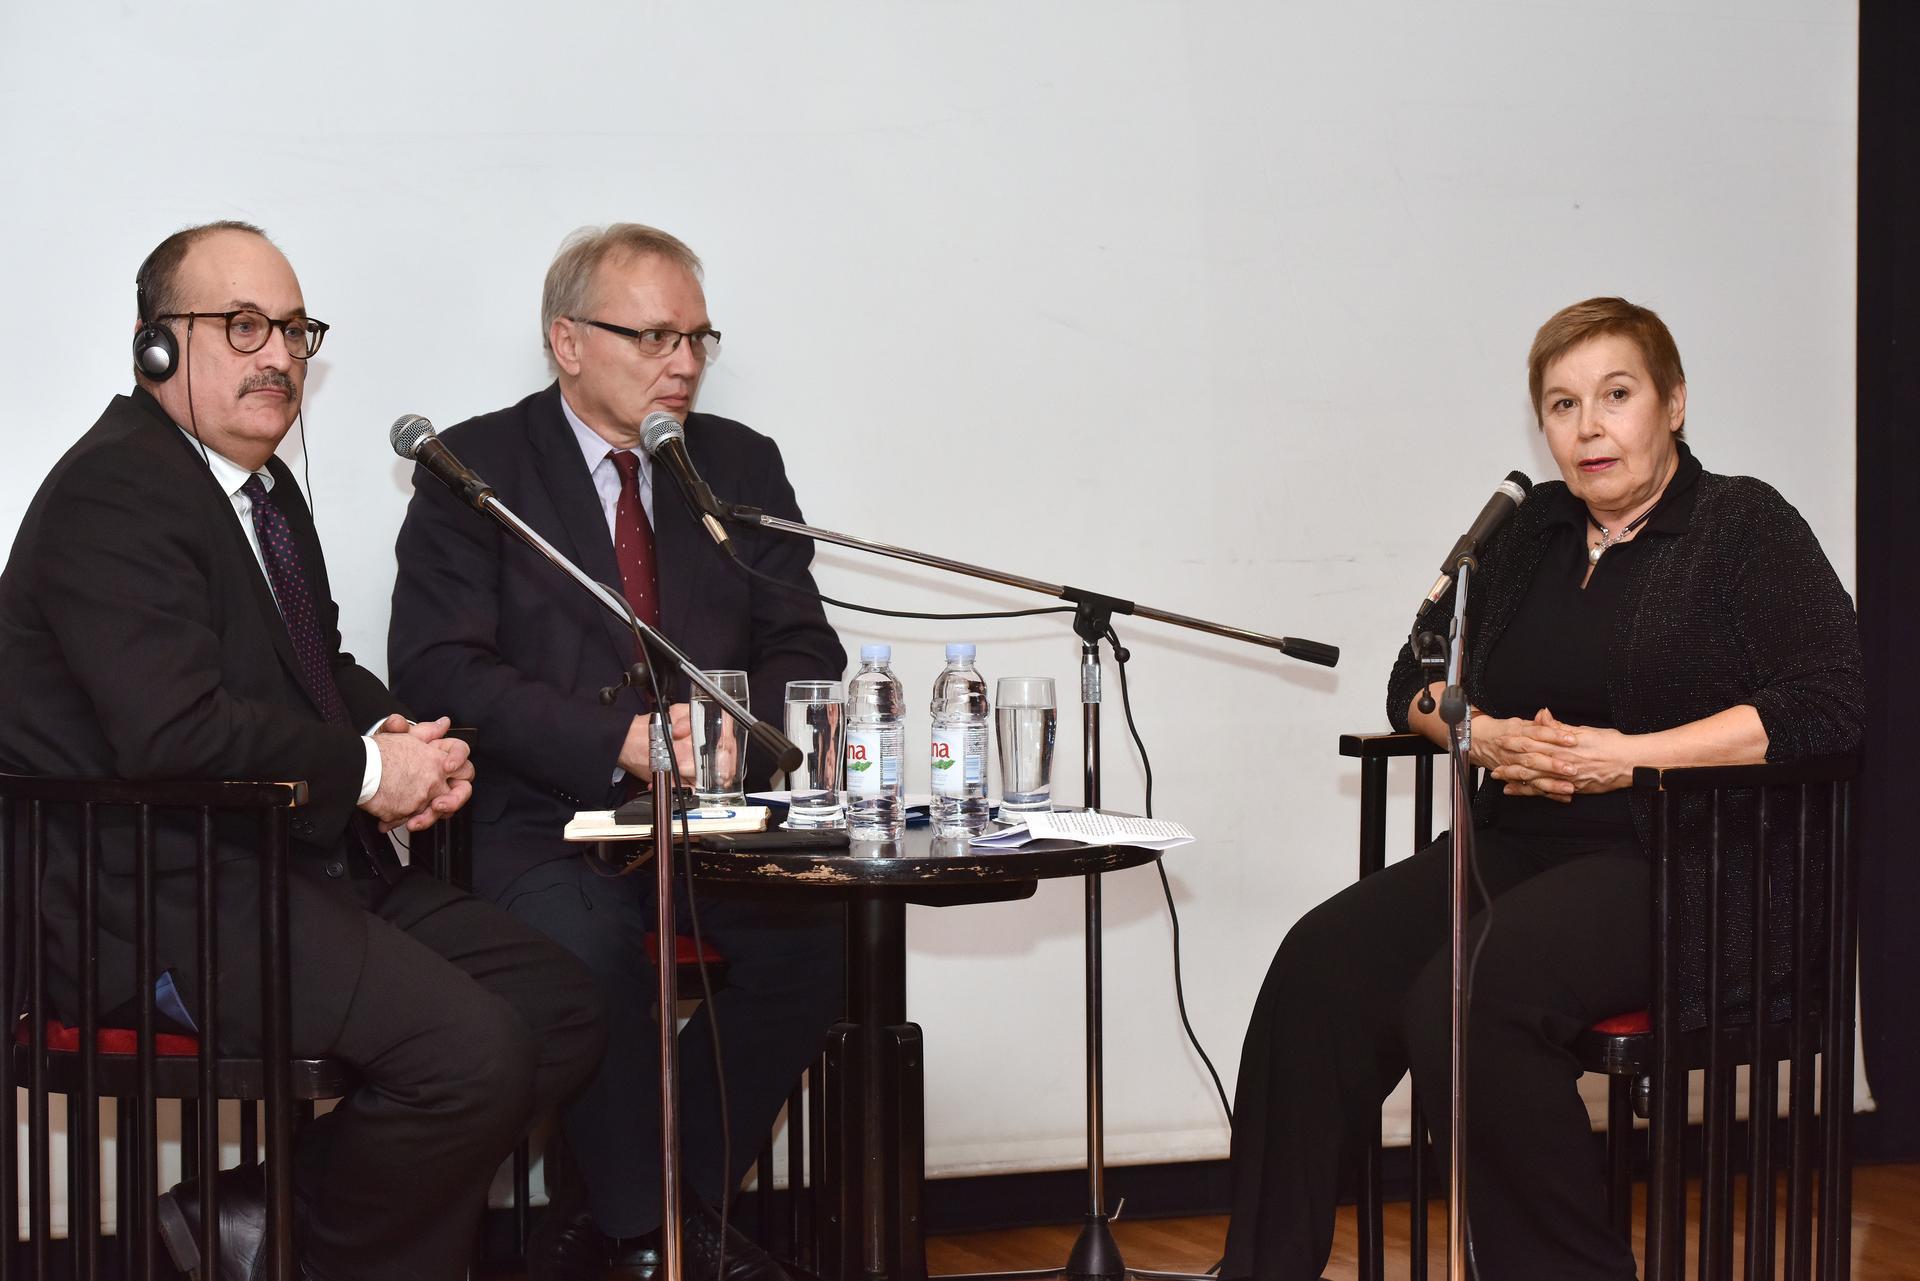 Foto: Davor Višnjić / PIHSELL